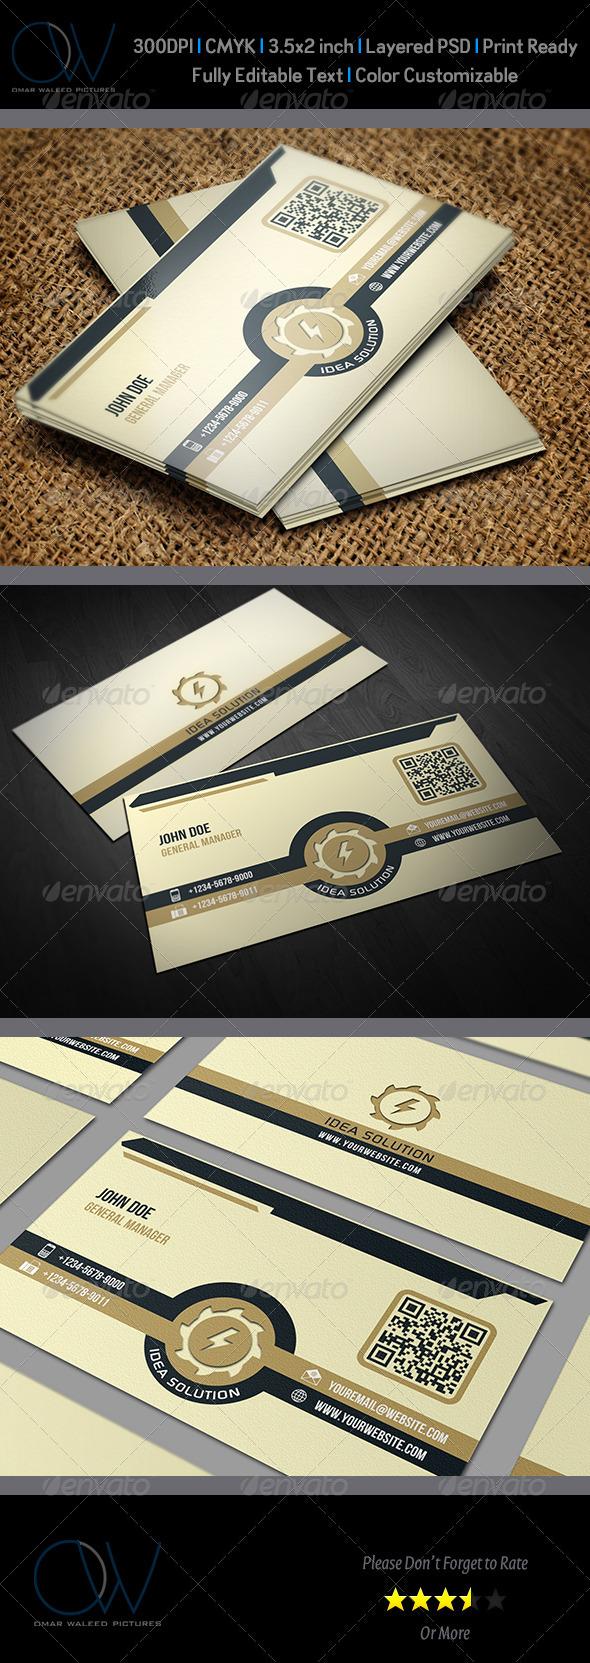 Corporate Business Card Vol.11 - Corporate Business Cards